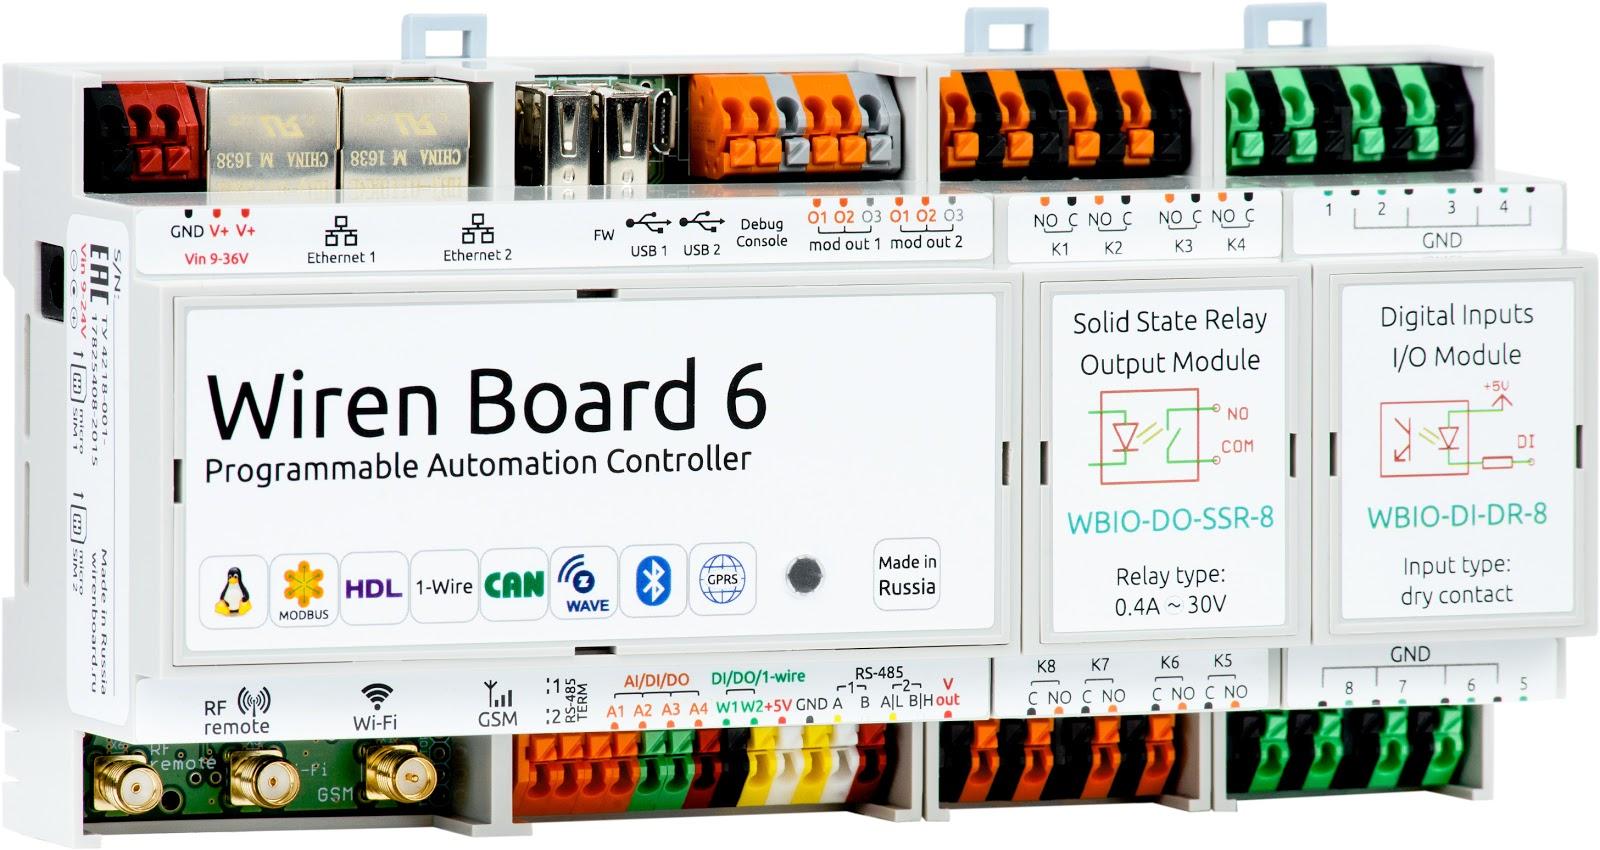 Wiren Board 6: снова на Хабре с новой версией контроллера для автоматизации - 1